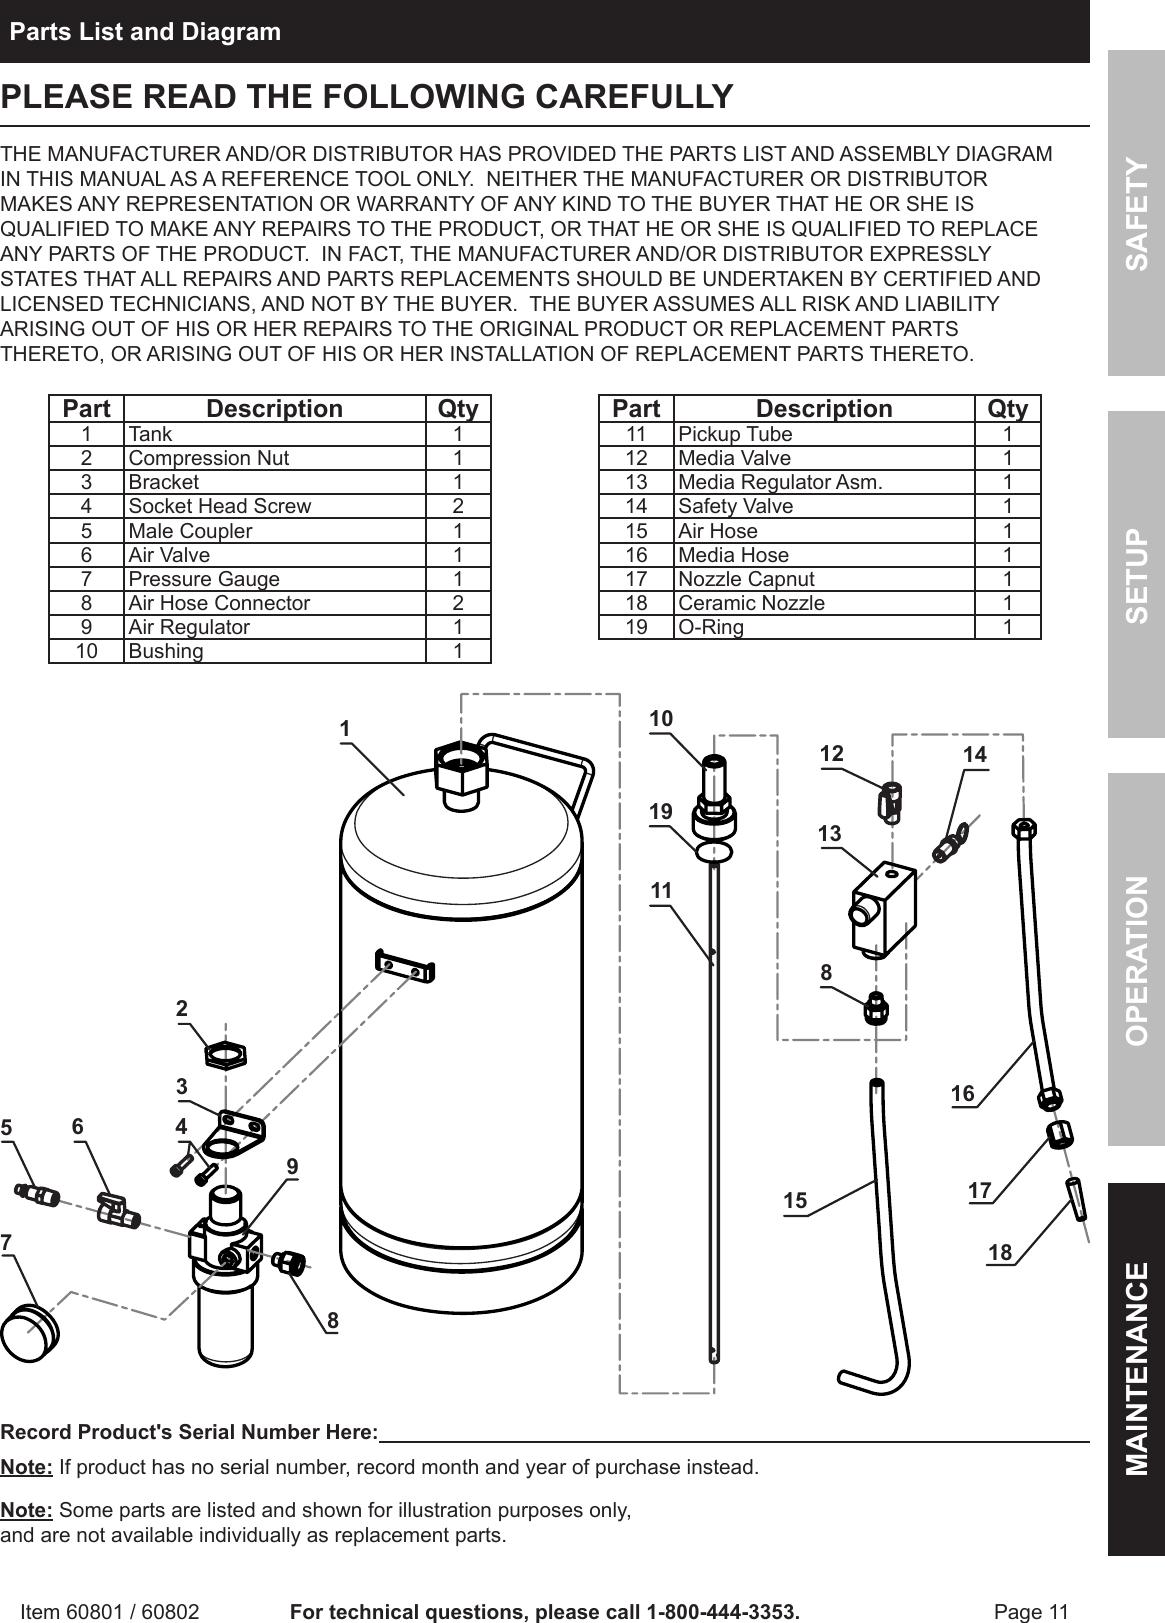 Harbor Freight 15 Lb Portable Soda Blaster Product Manual